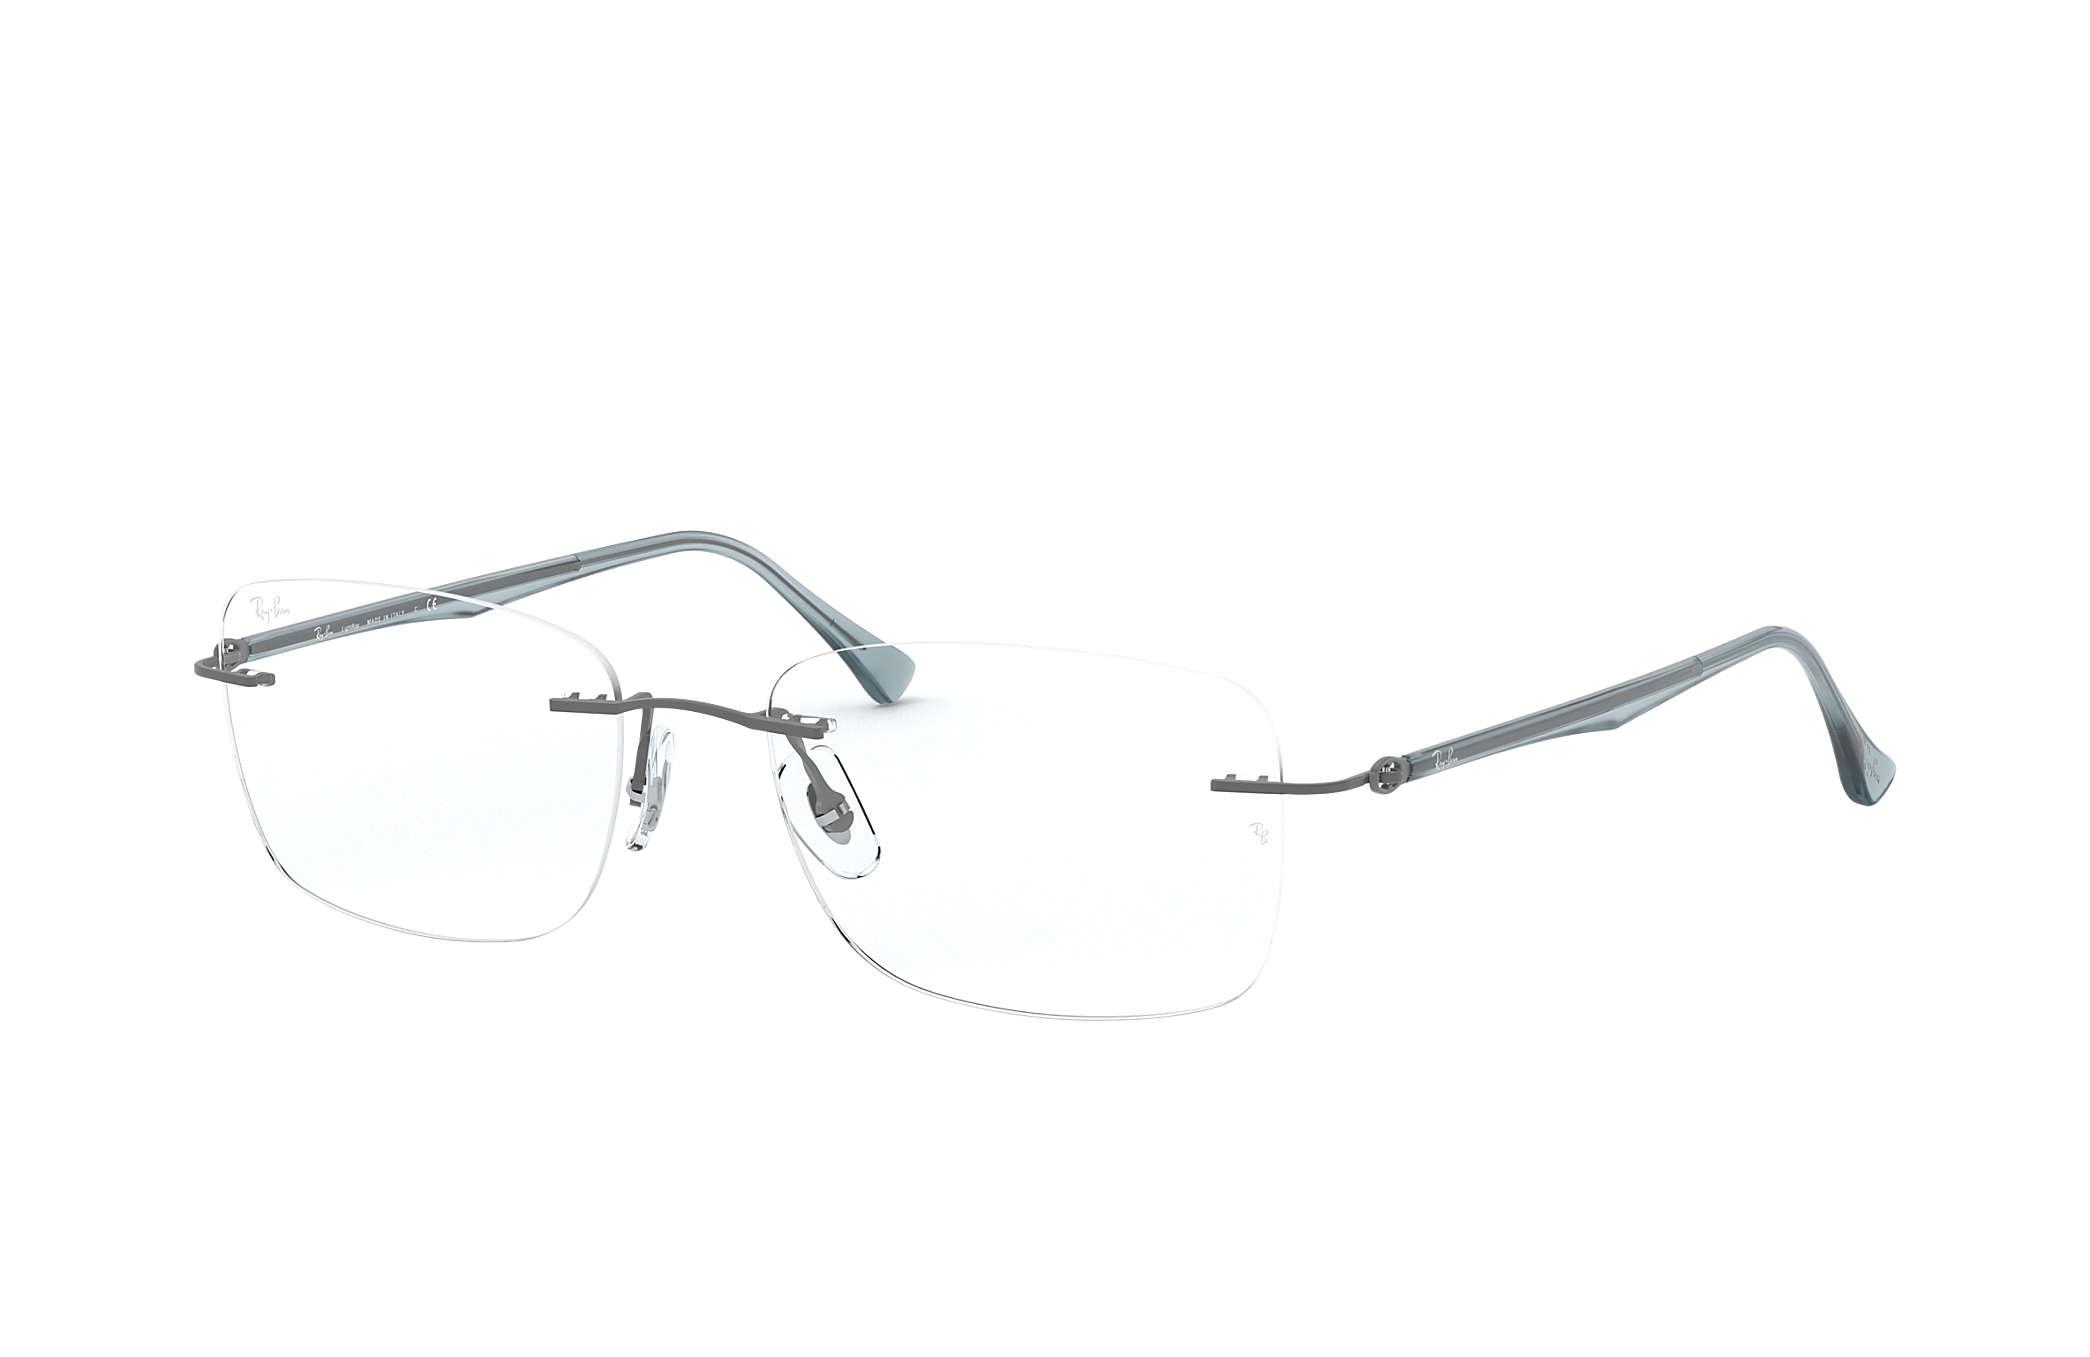 Ray Ban Rx 5069 Eyeglasses Walmart Frames